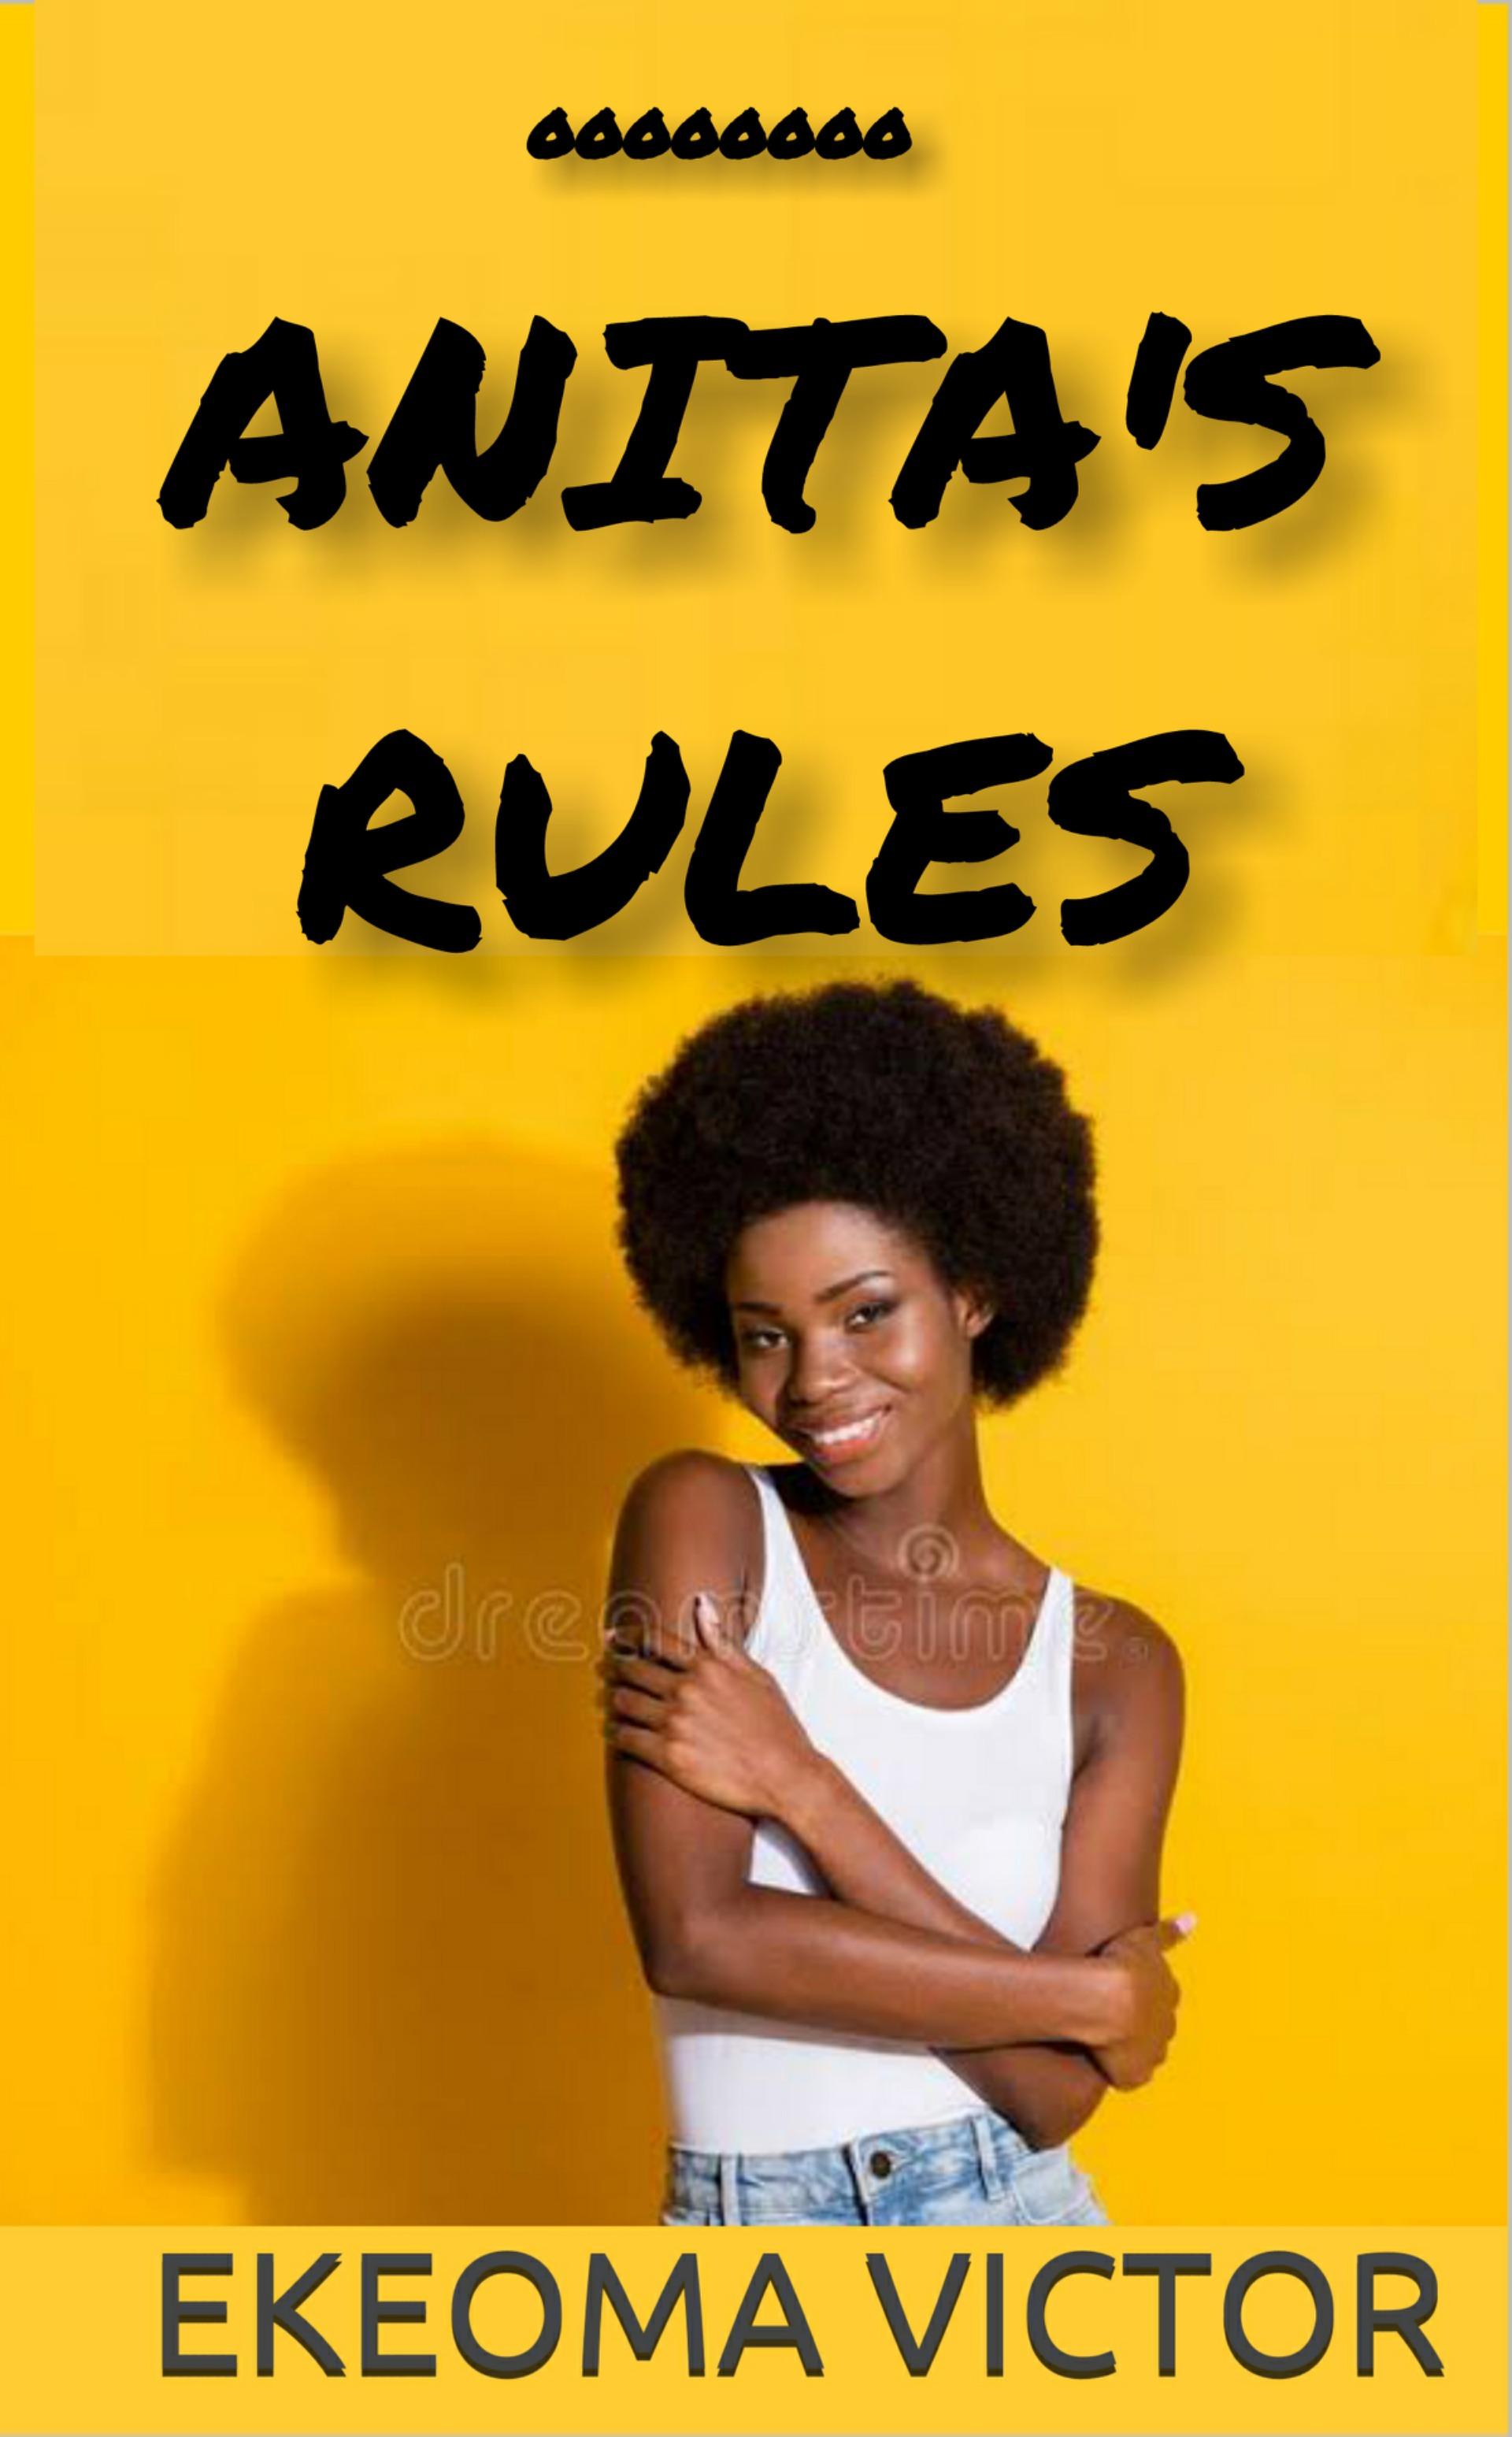 ANITA'S RULES